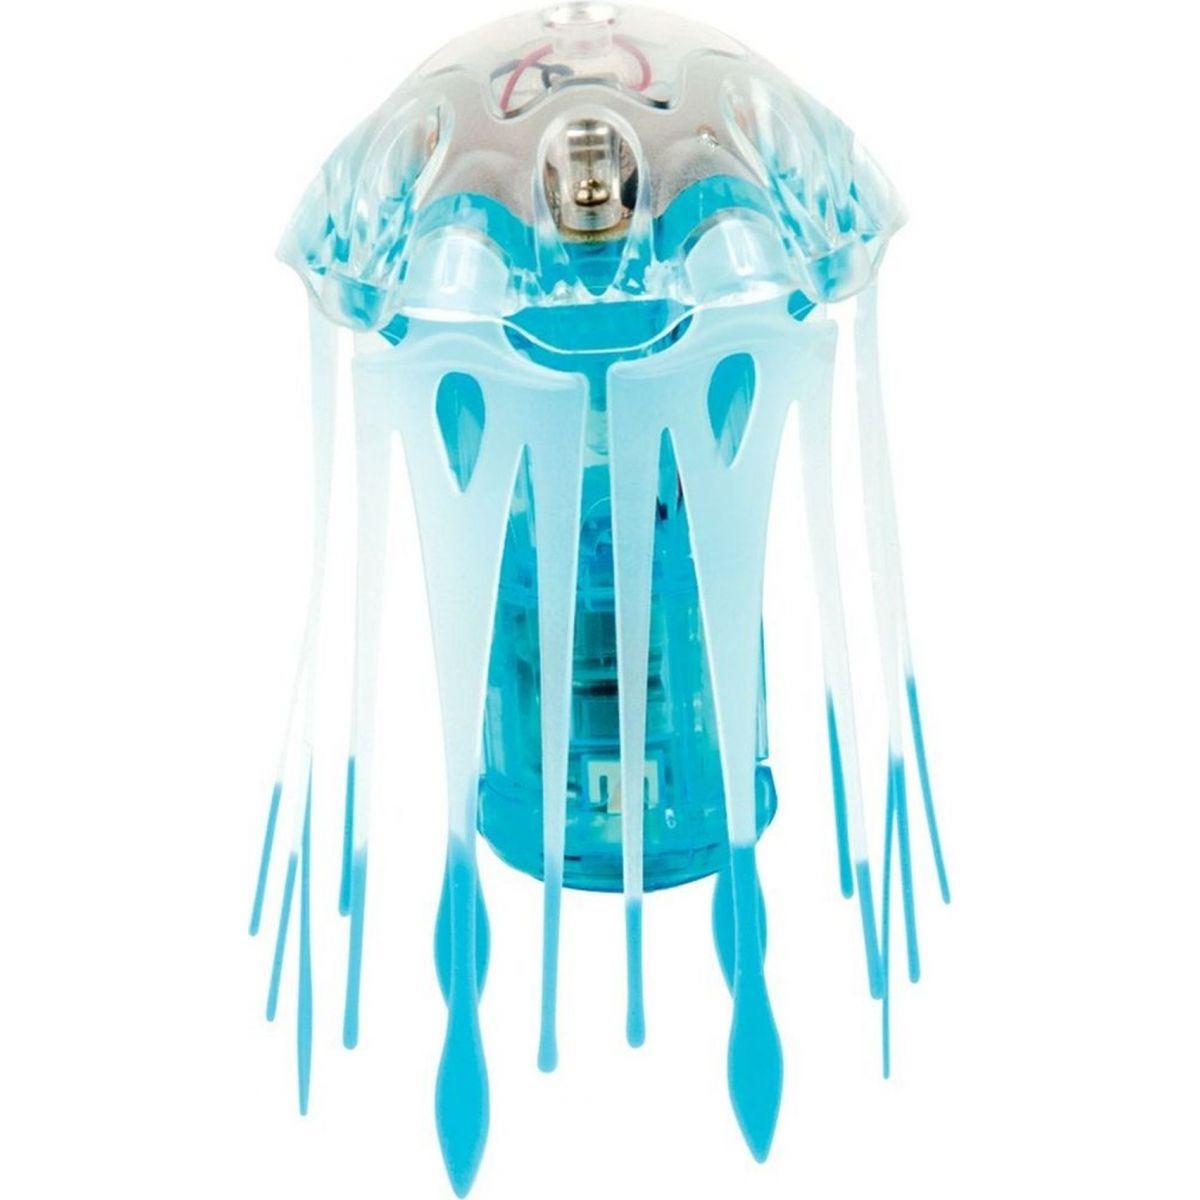 Hexbug Aquabot Medúza - Tyrkysová